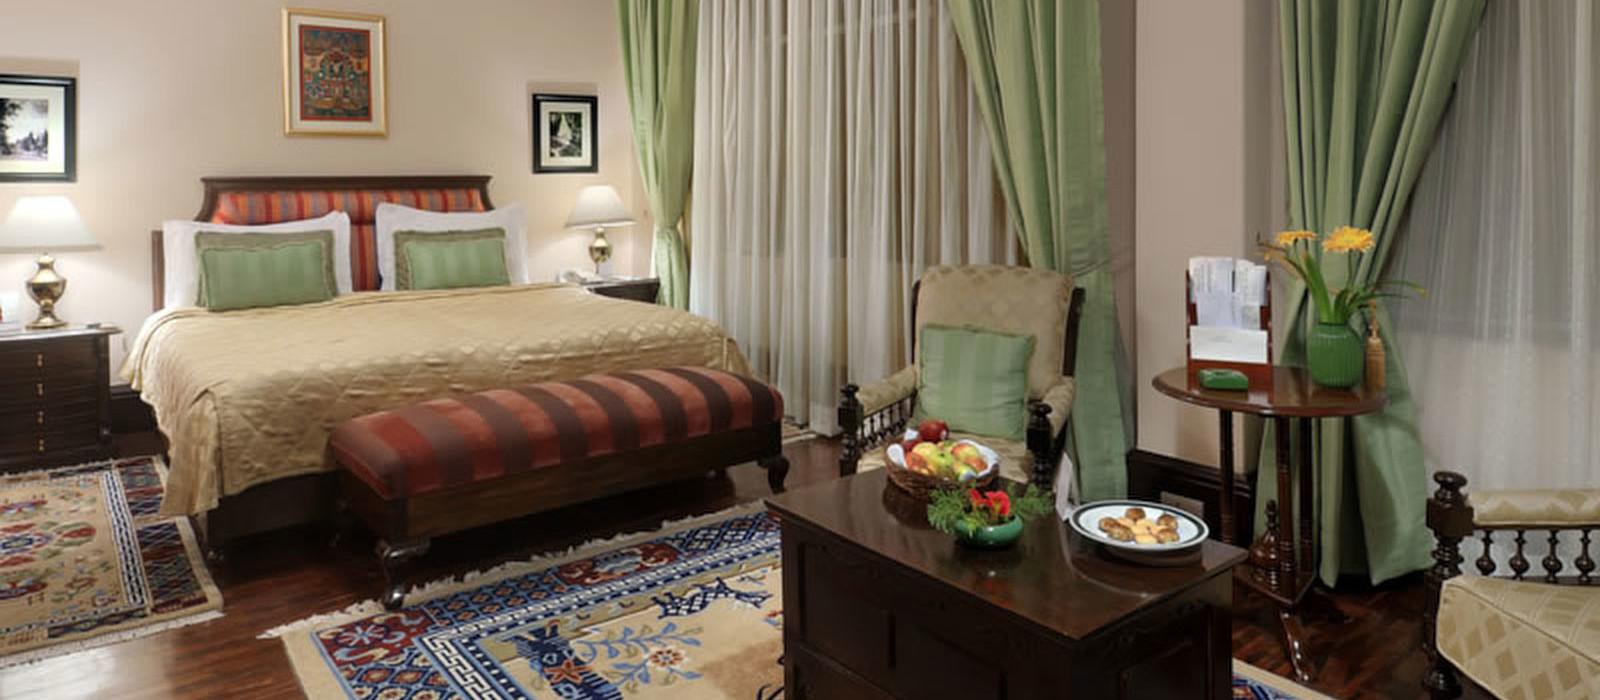 Hotel Elgin Nor Khill  Ostindien